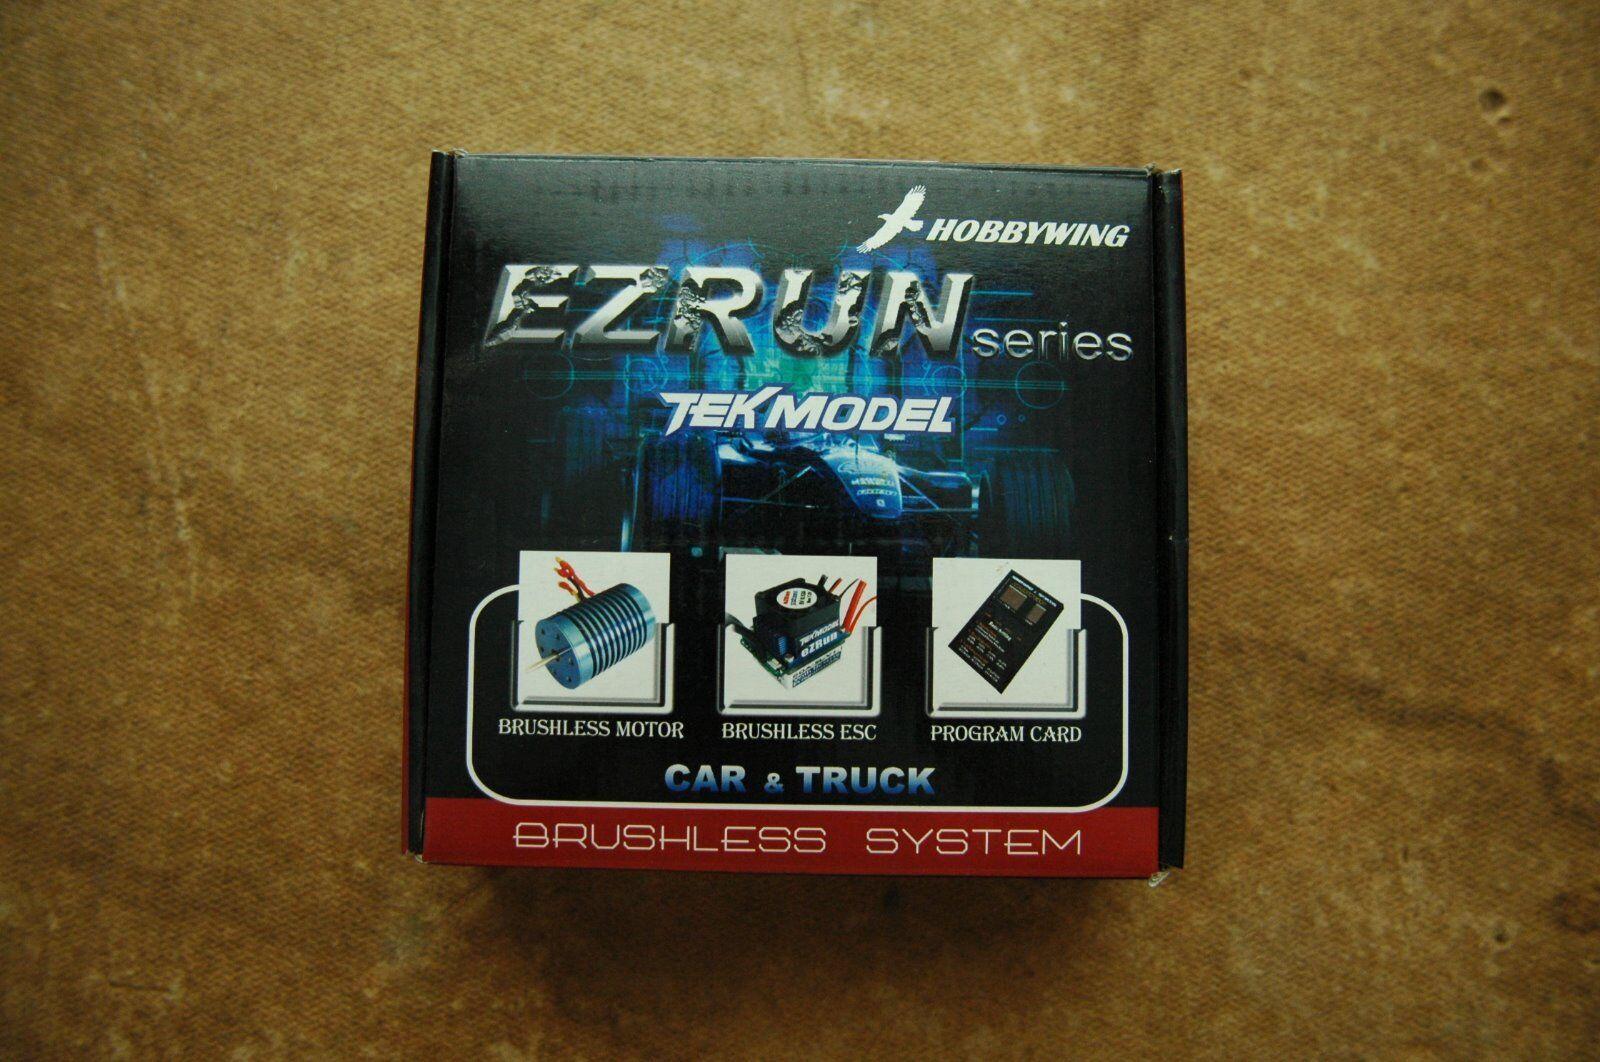 Hobbywing EZRUN Series TEKMODEL 1/10th Combo